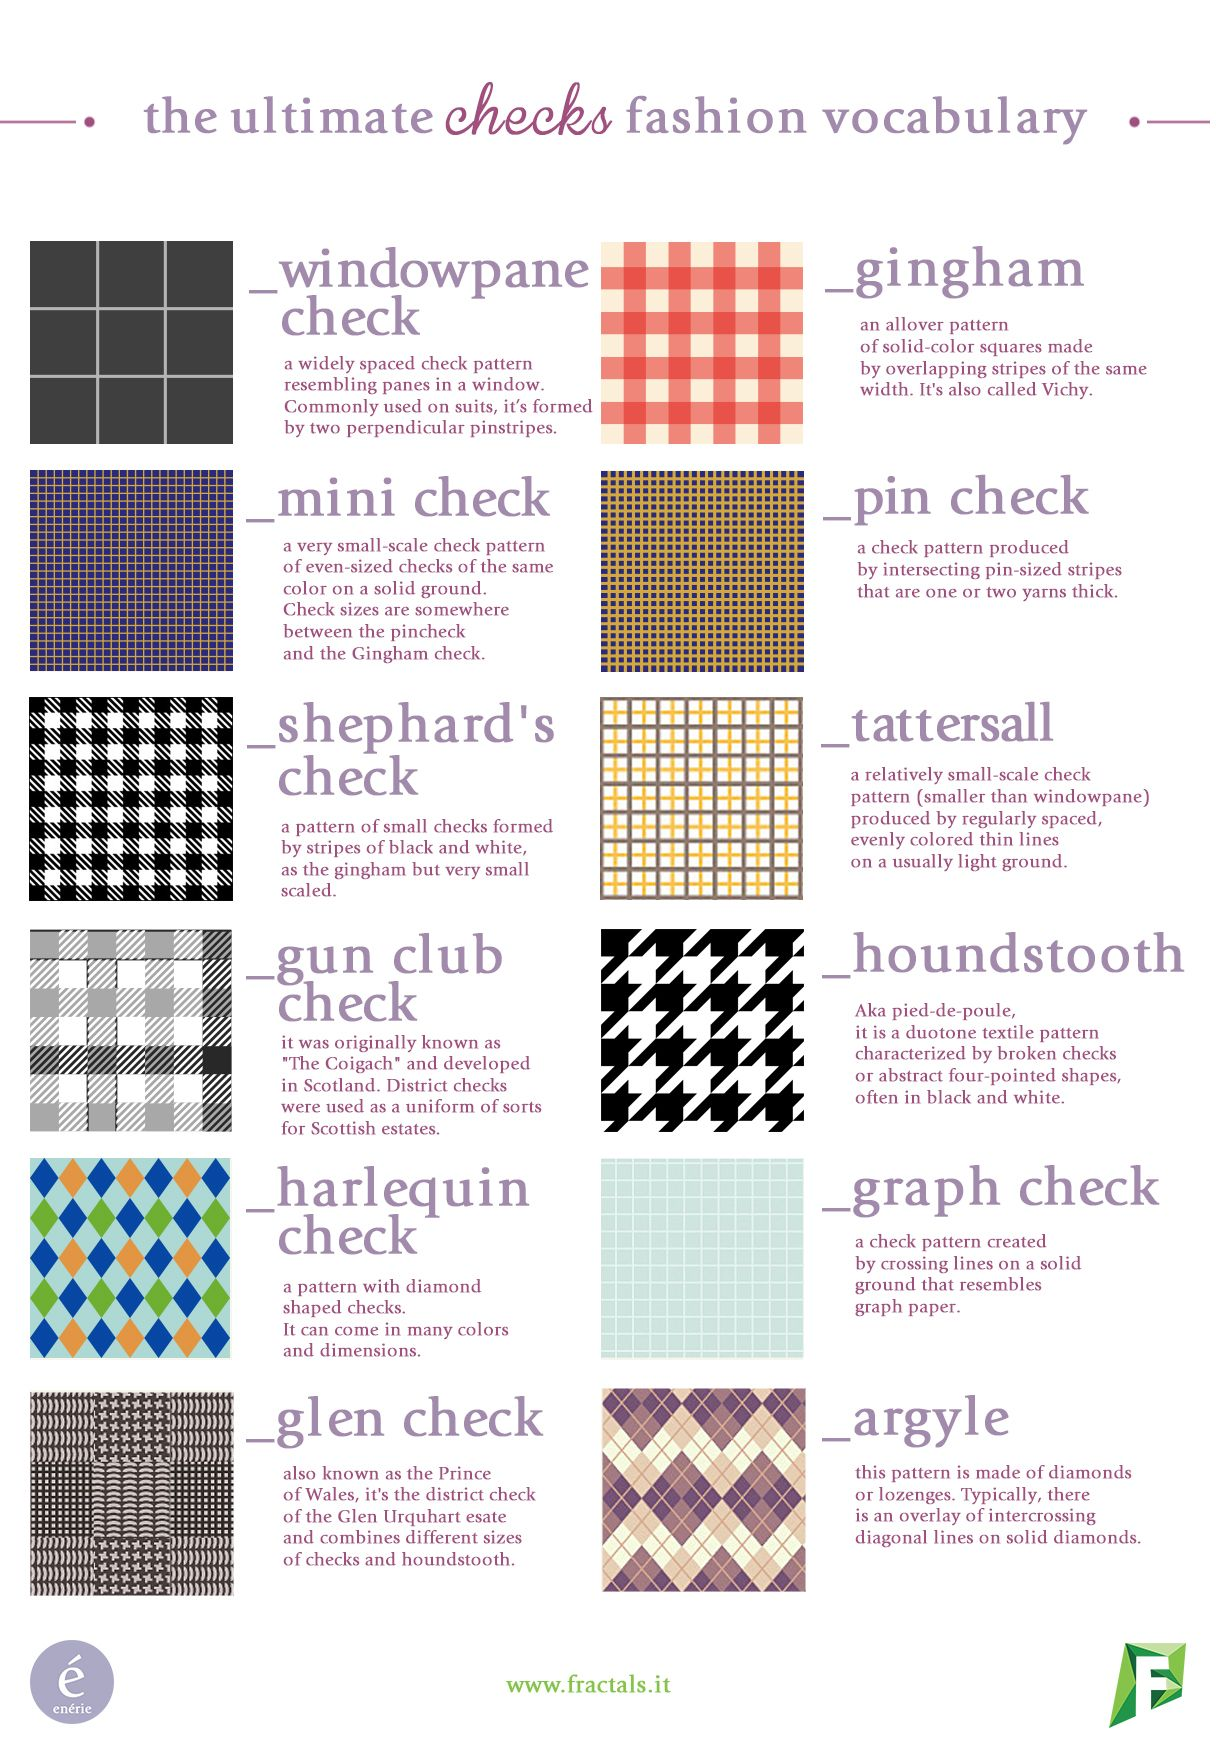 The Ultimate Checks Fashion Vocabulary